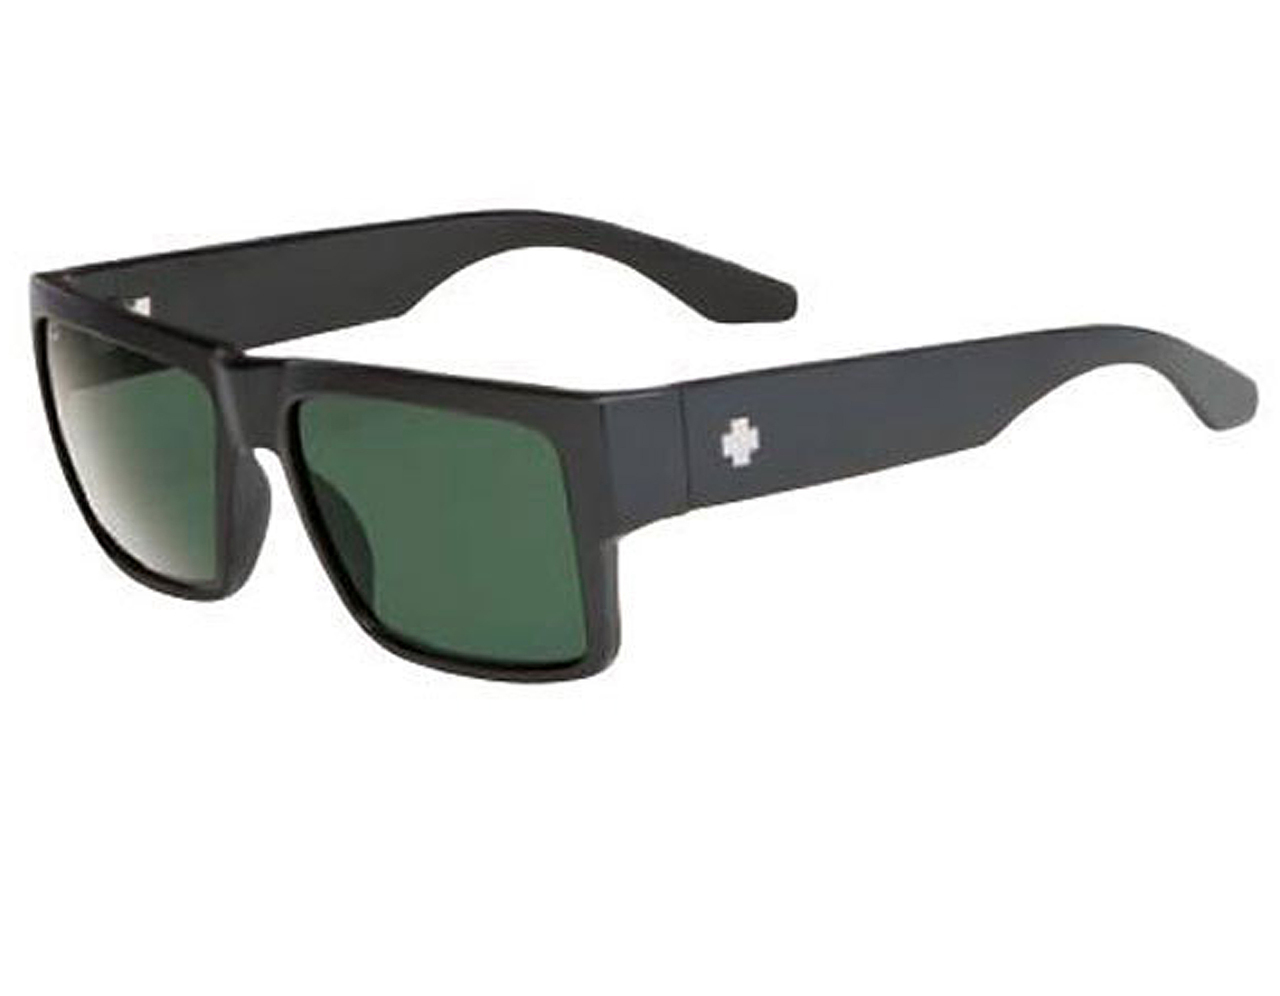 44955585fe4f6 Cyrus Replacement Lenses by SEEK OPTICS to fit SPY OPTICS Sunglasses ...